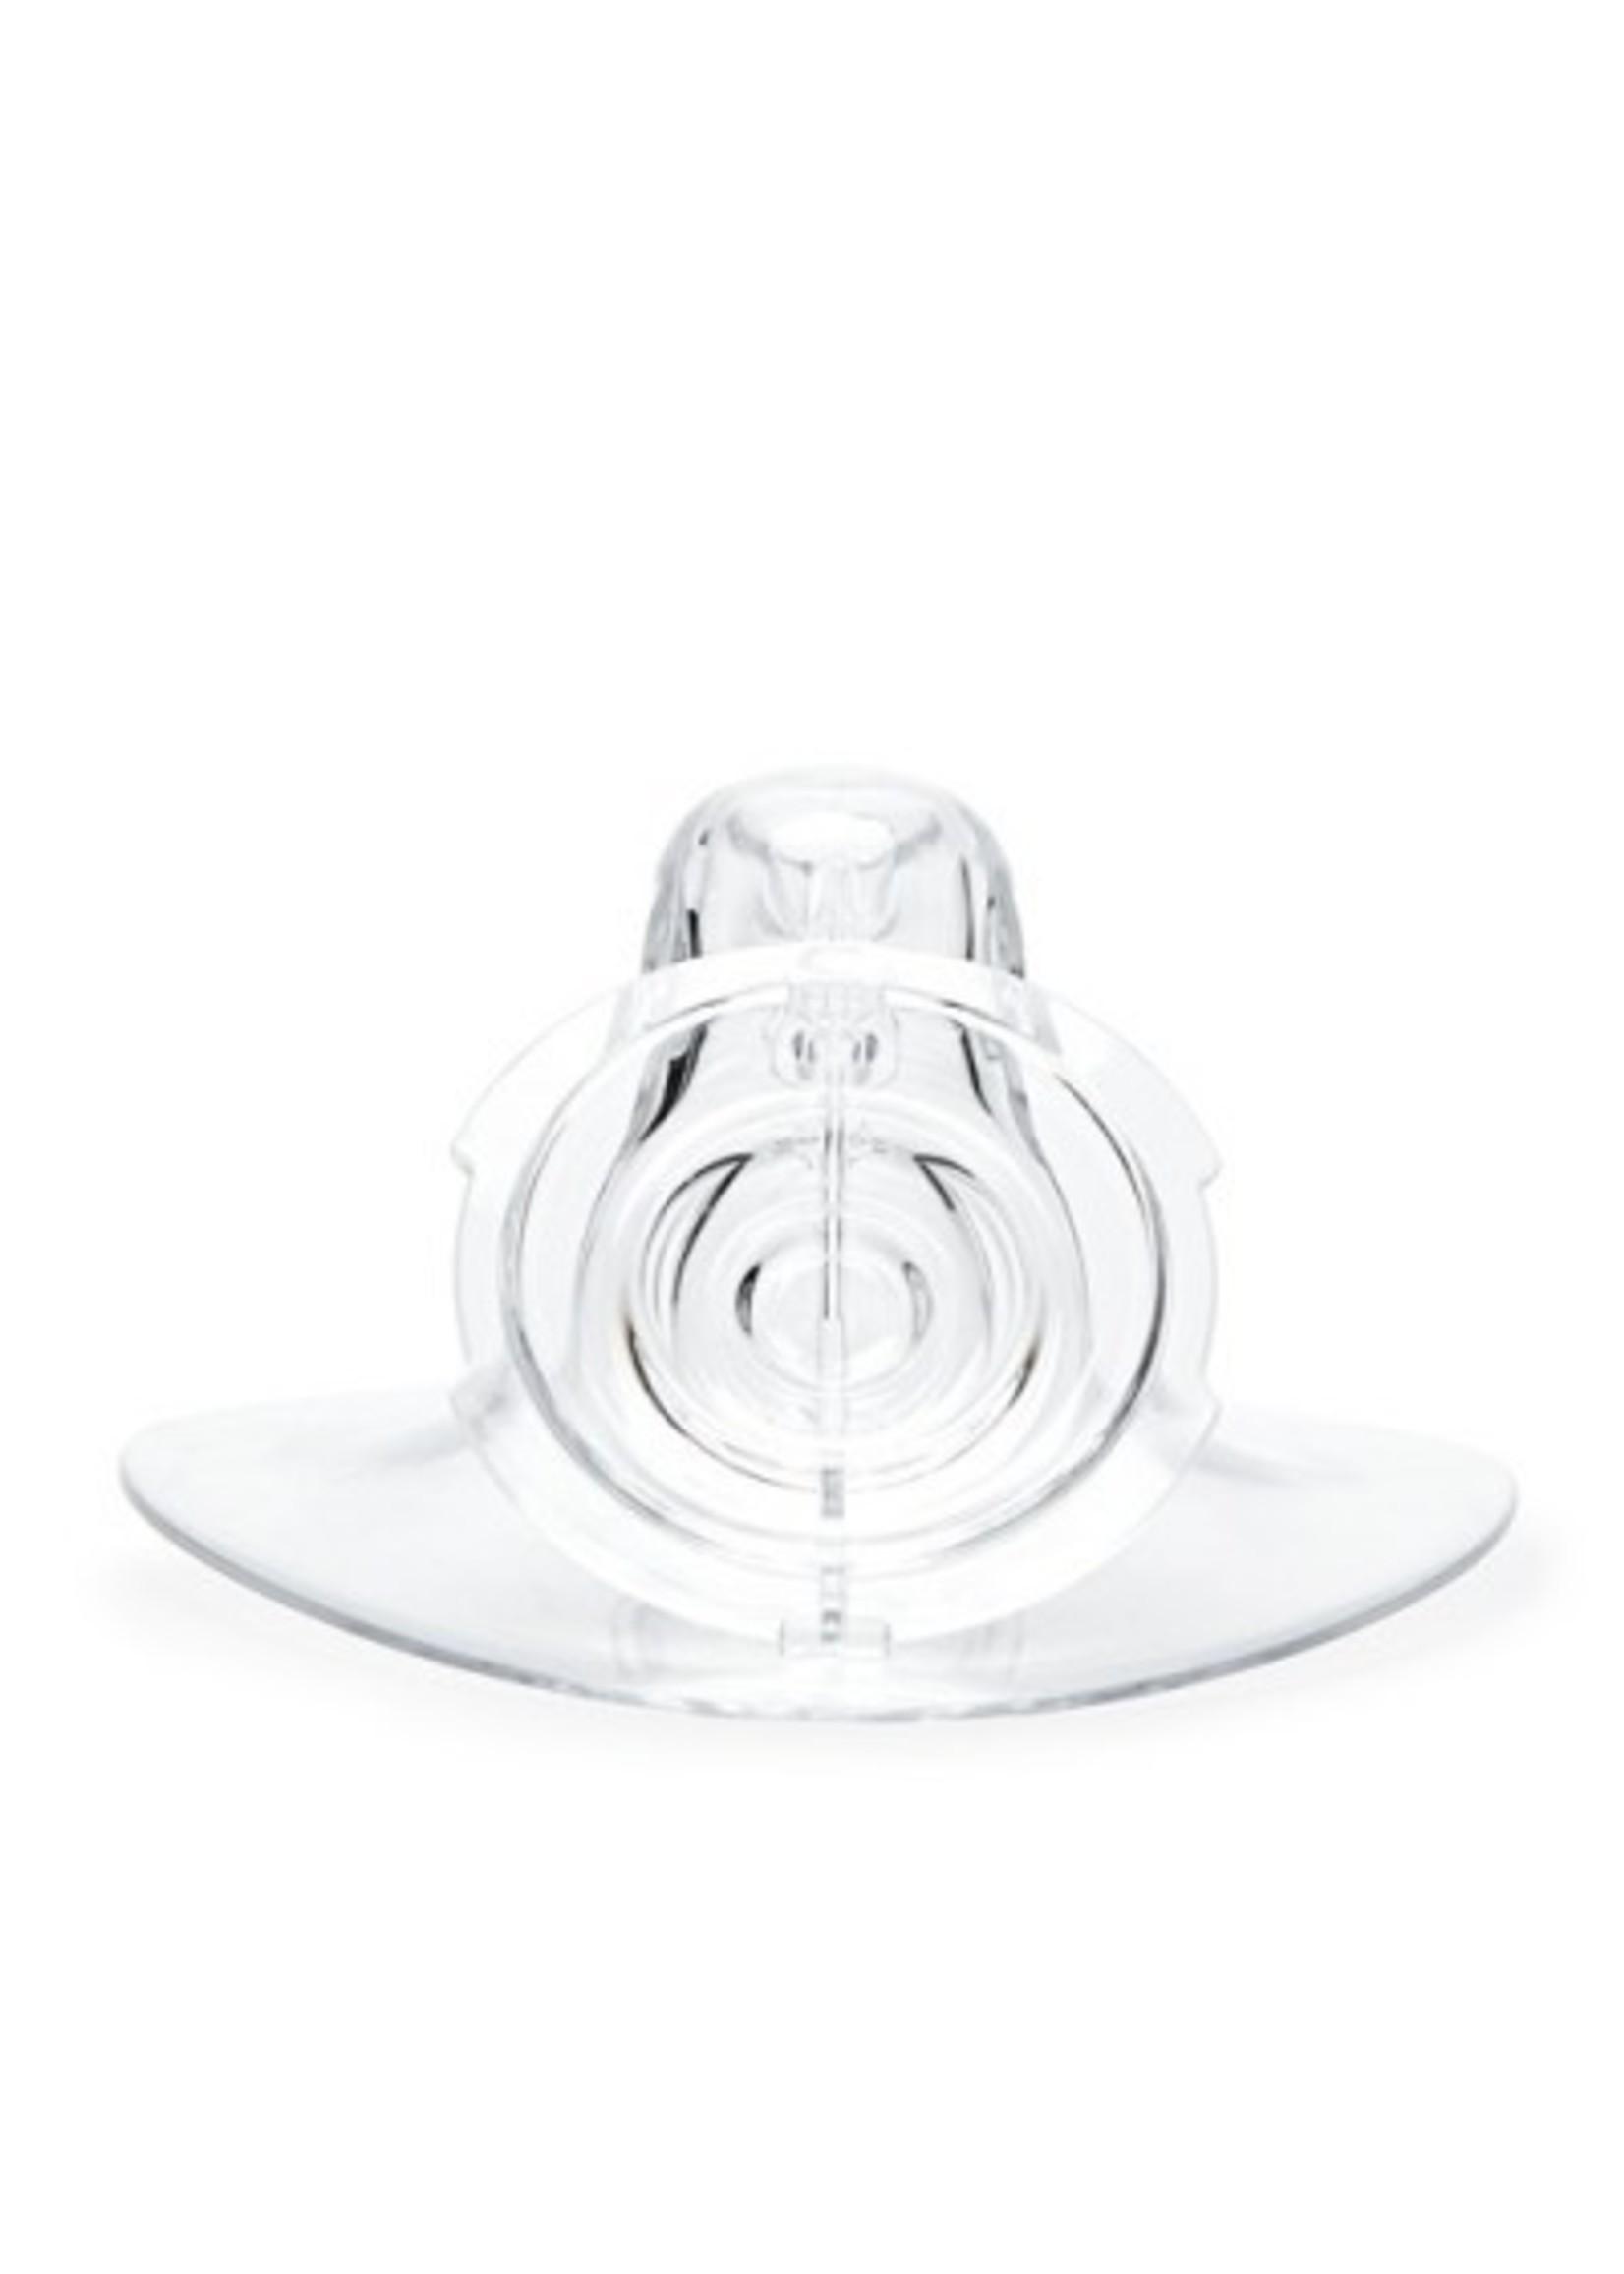 Elvie Breast shield - 21mm